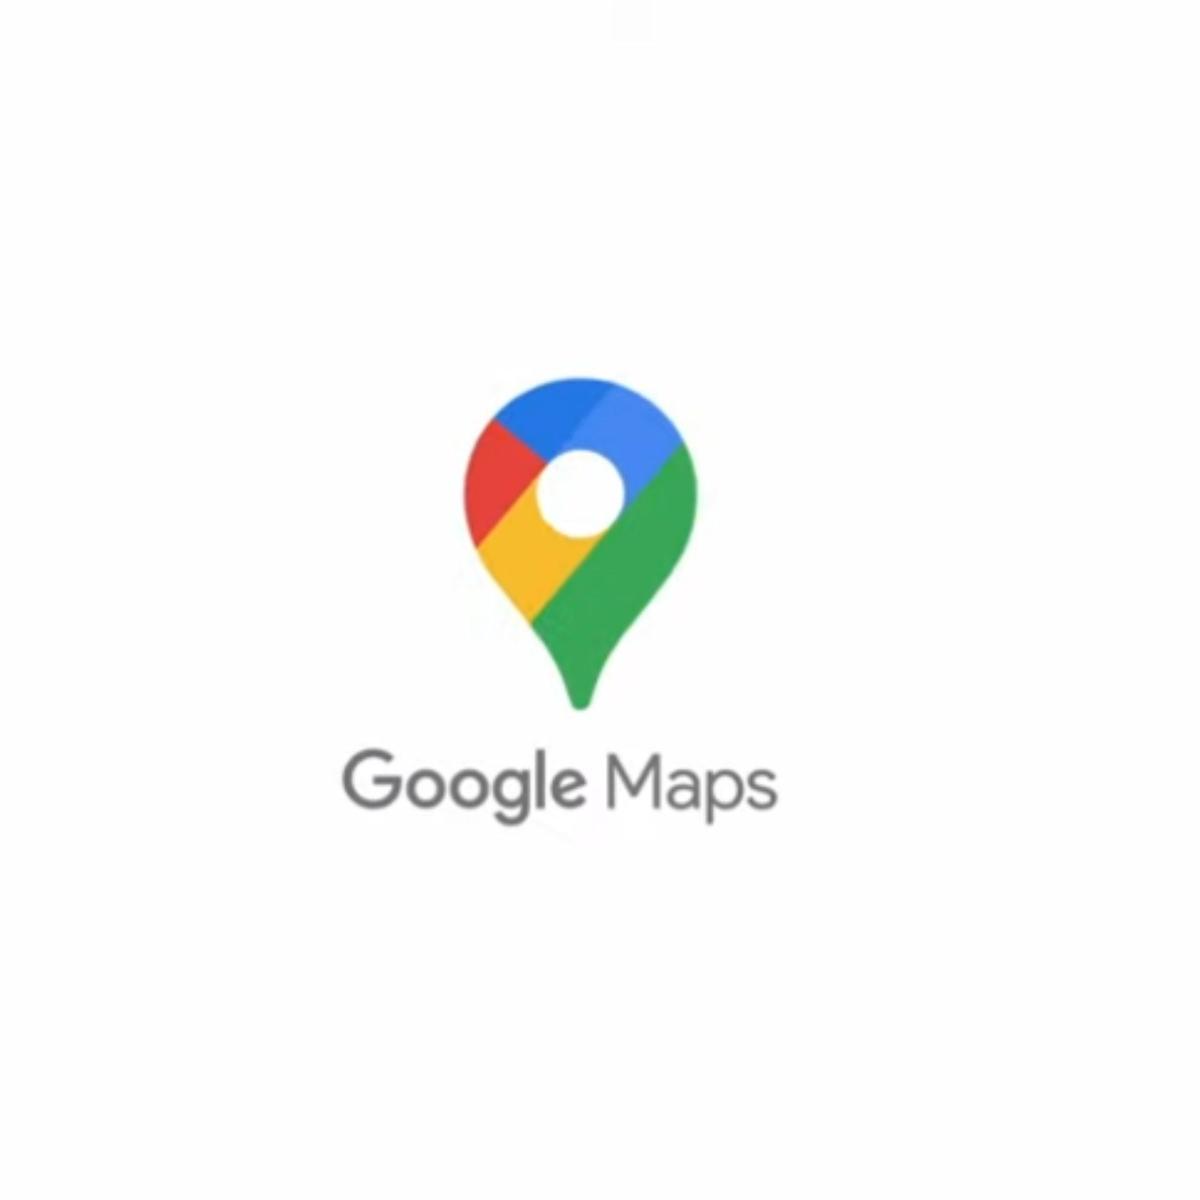 Google Maps unveils new logo to mark 15th anniversary